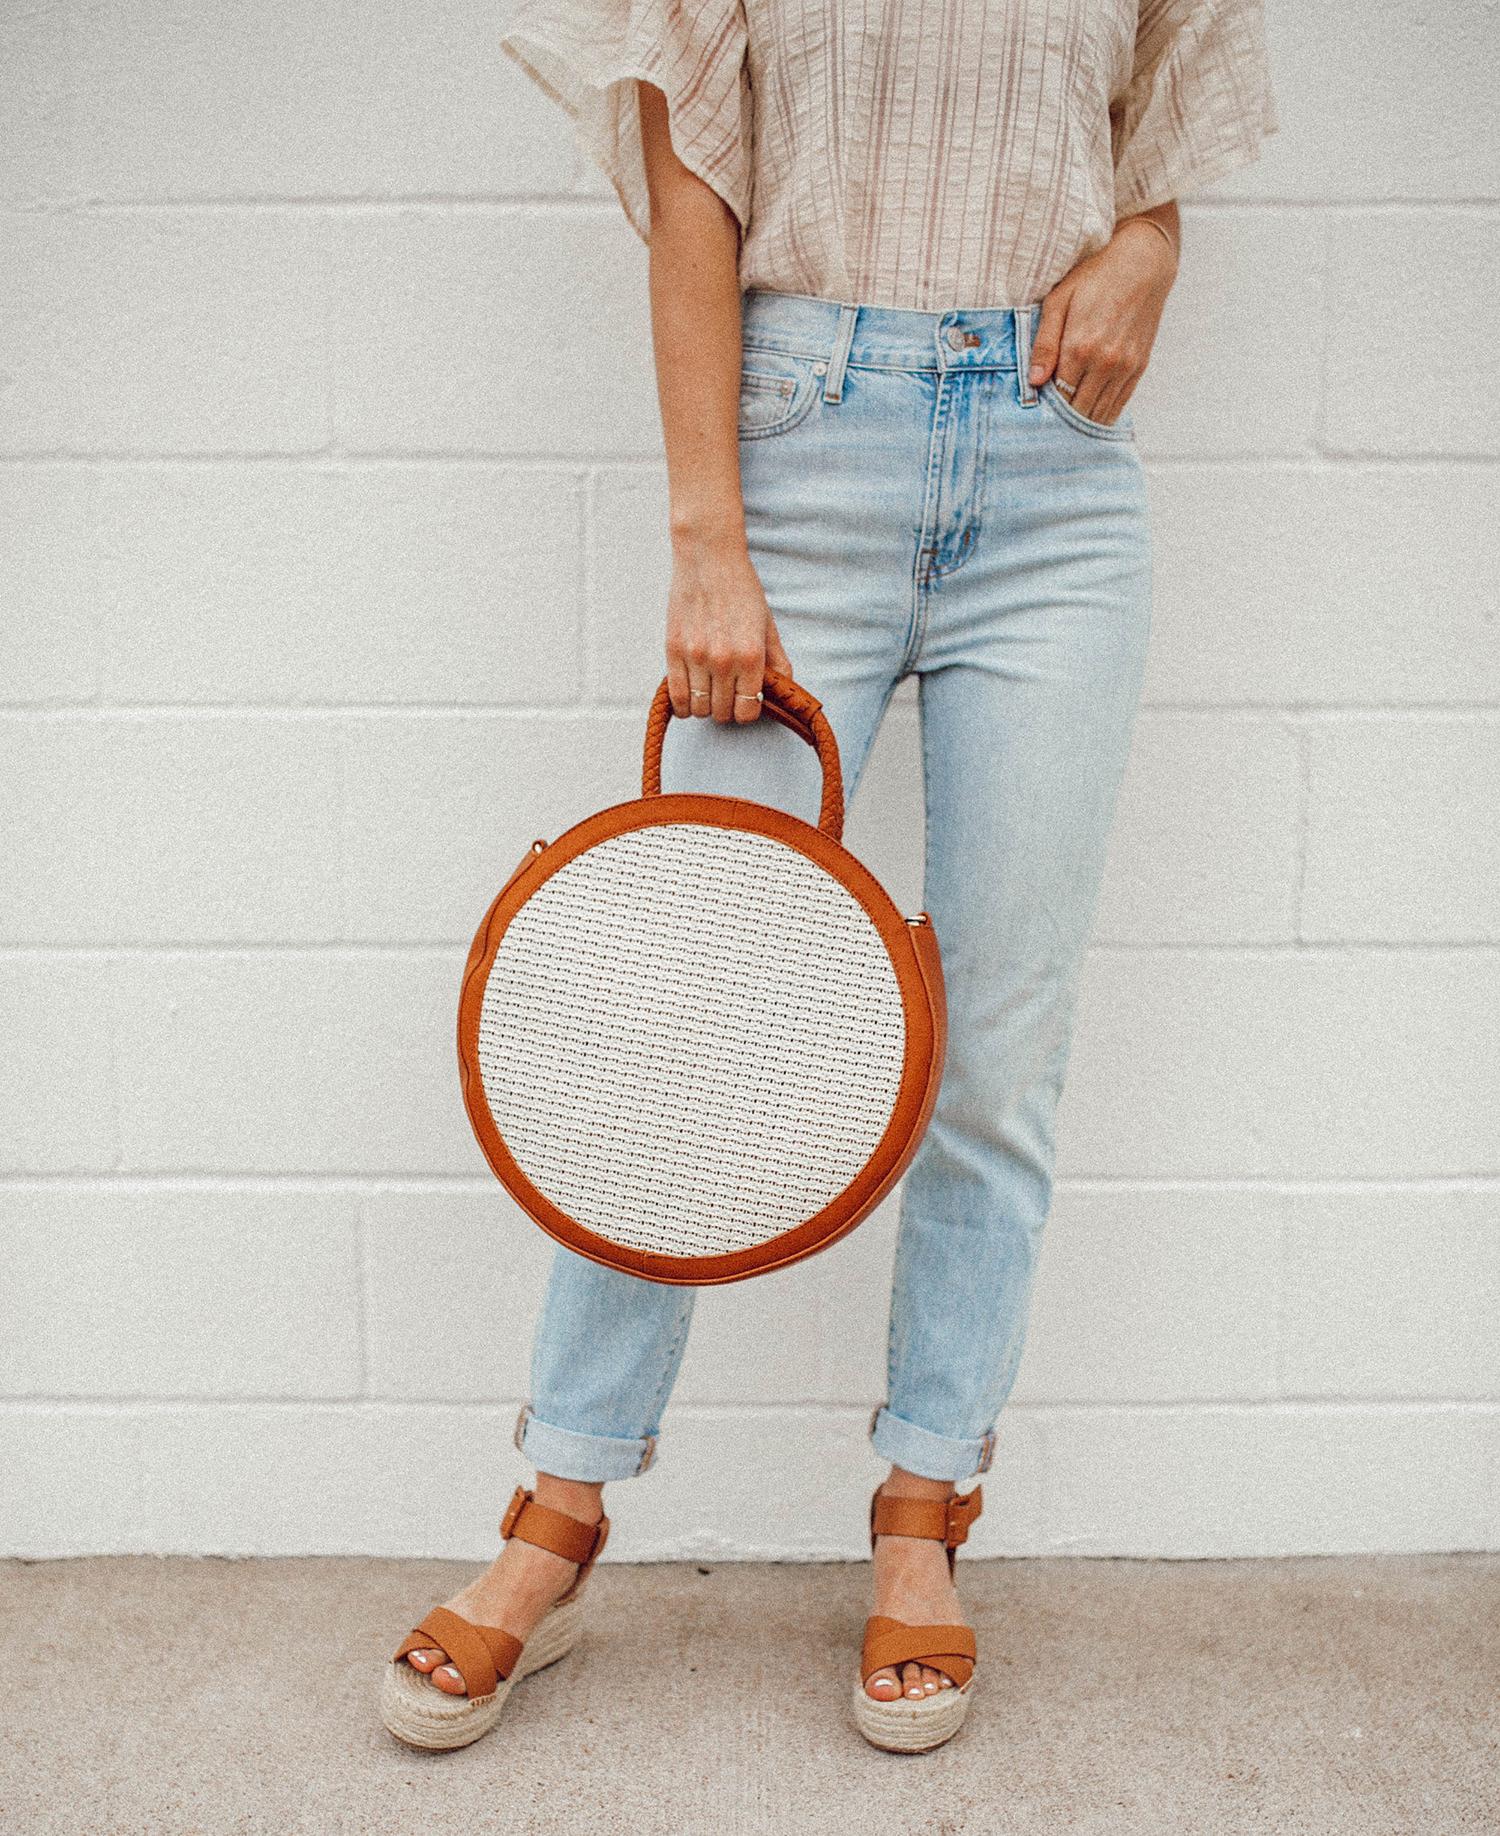 livvyland-blog-olivia-watson-sole-society-espadrille-wedges-round-straw-handbag-1